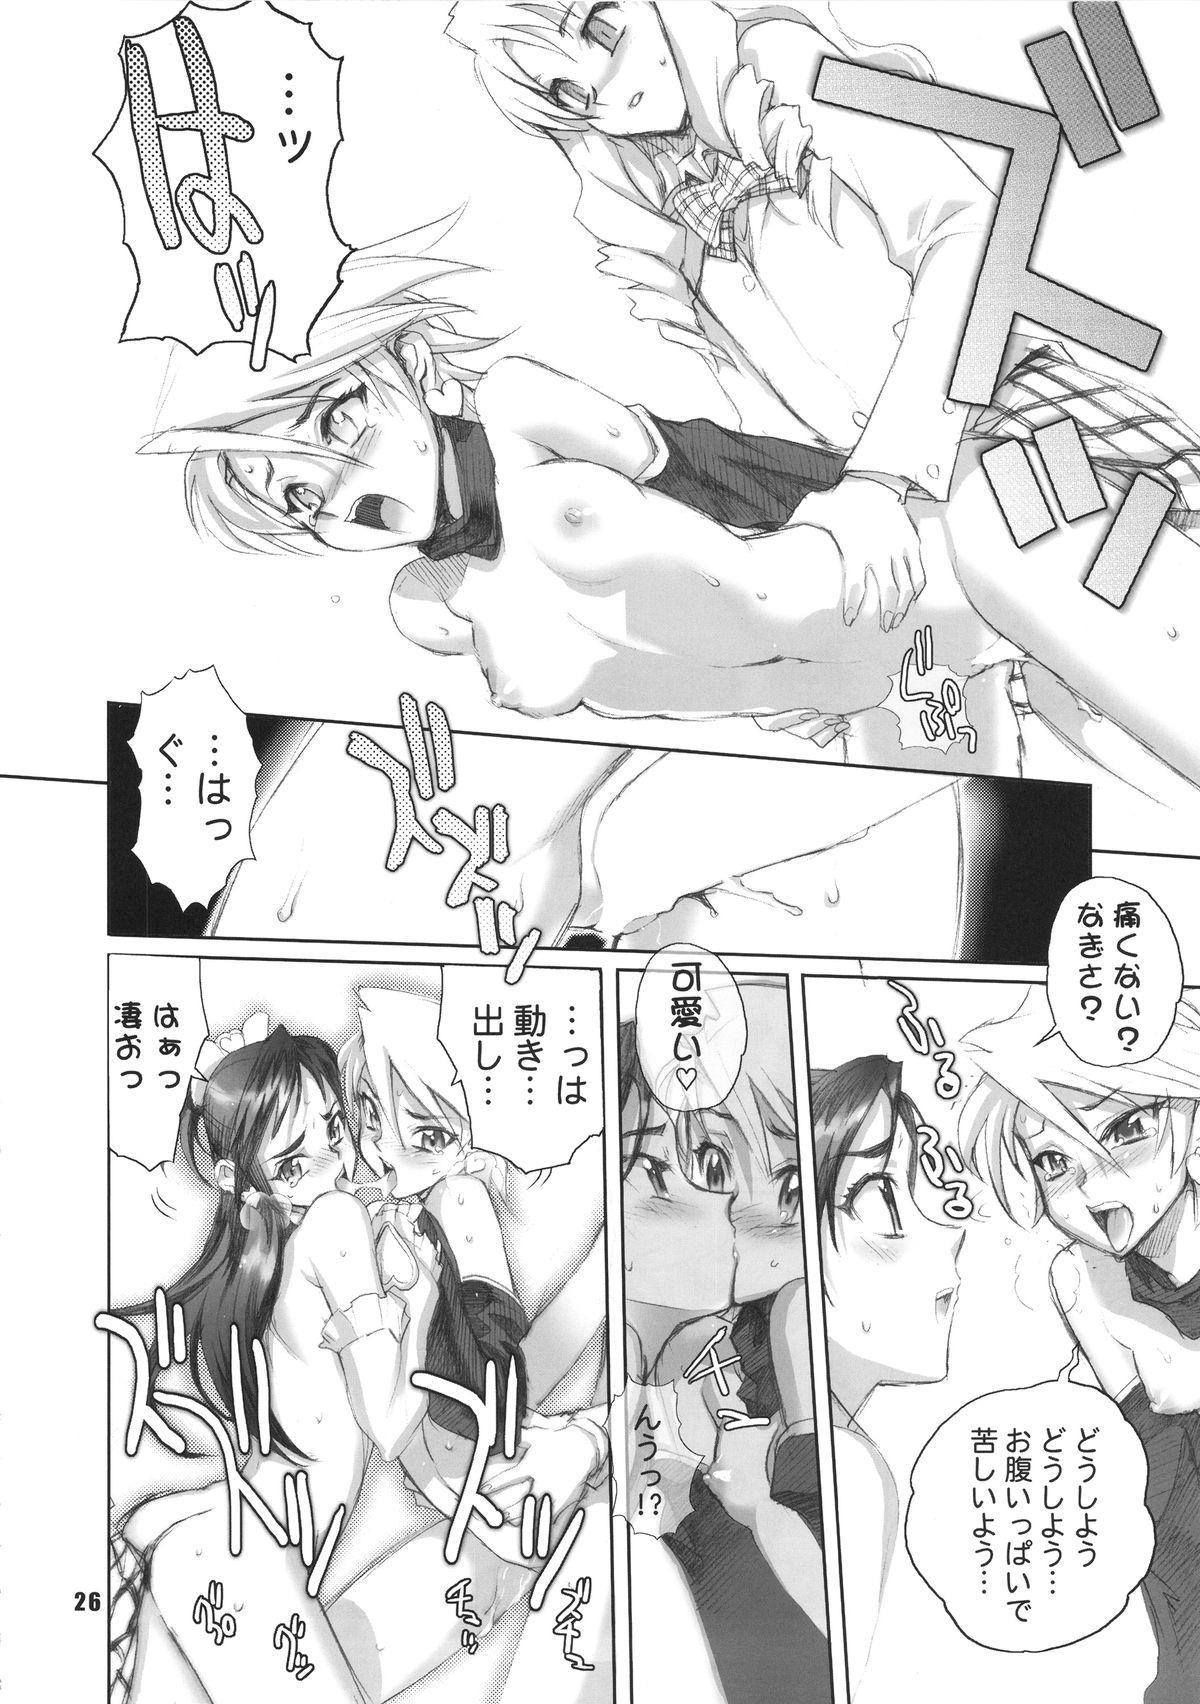 Inazuma Pretty Warrior 24